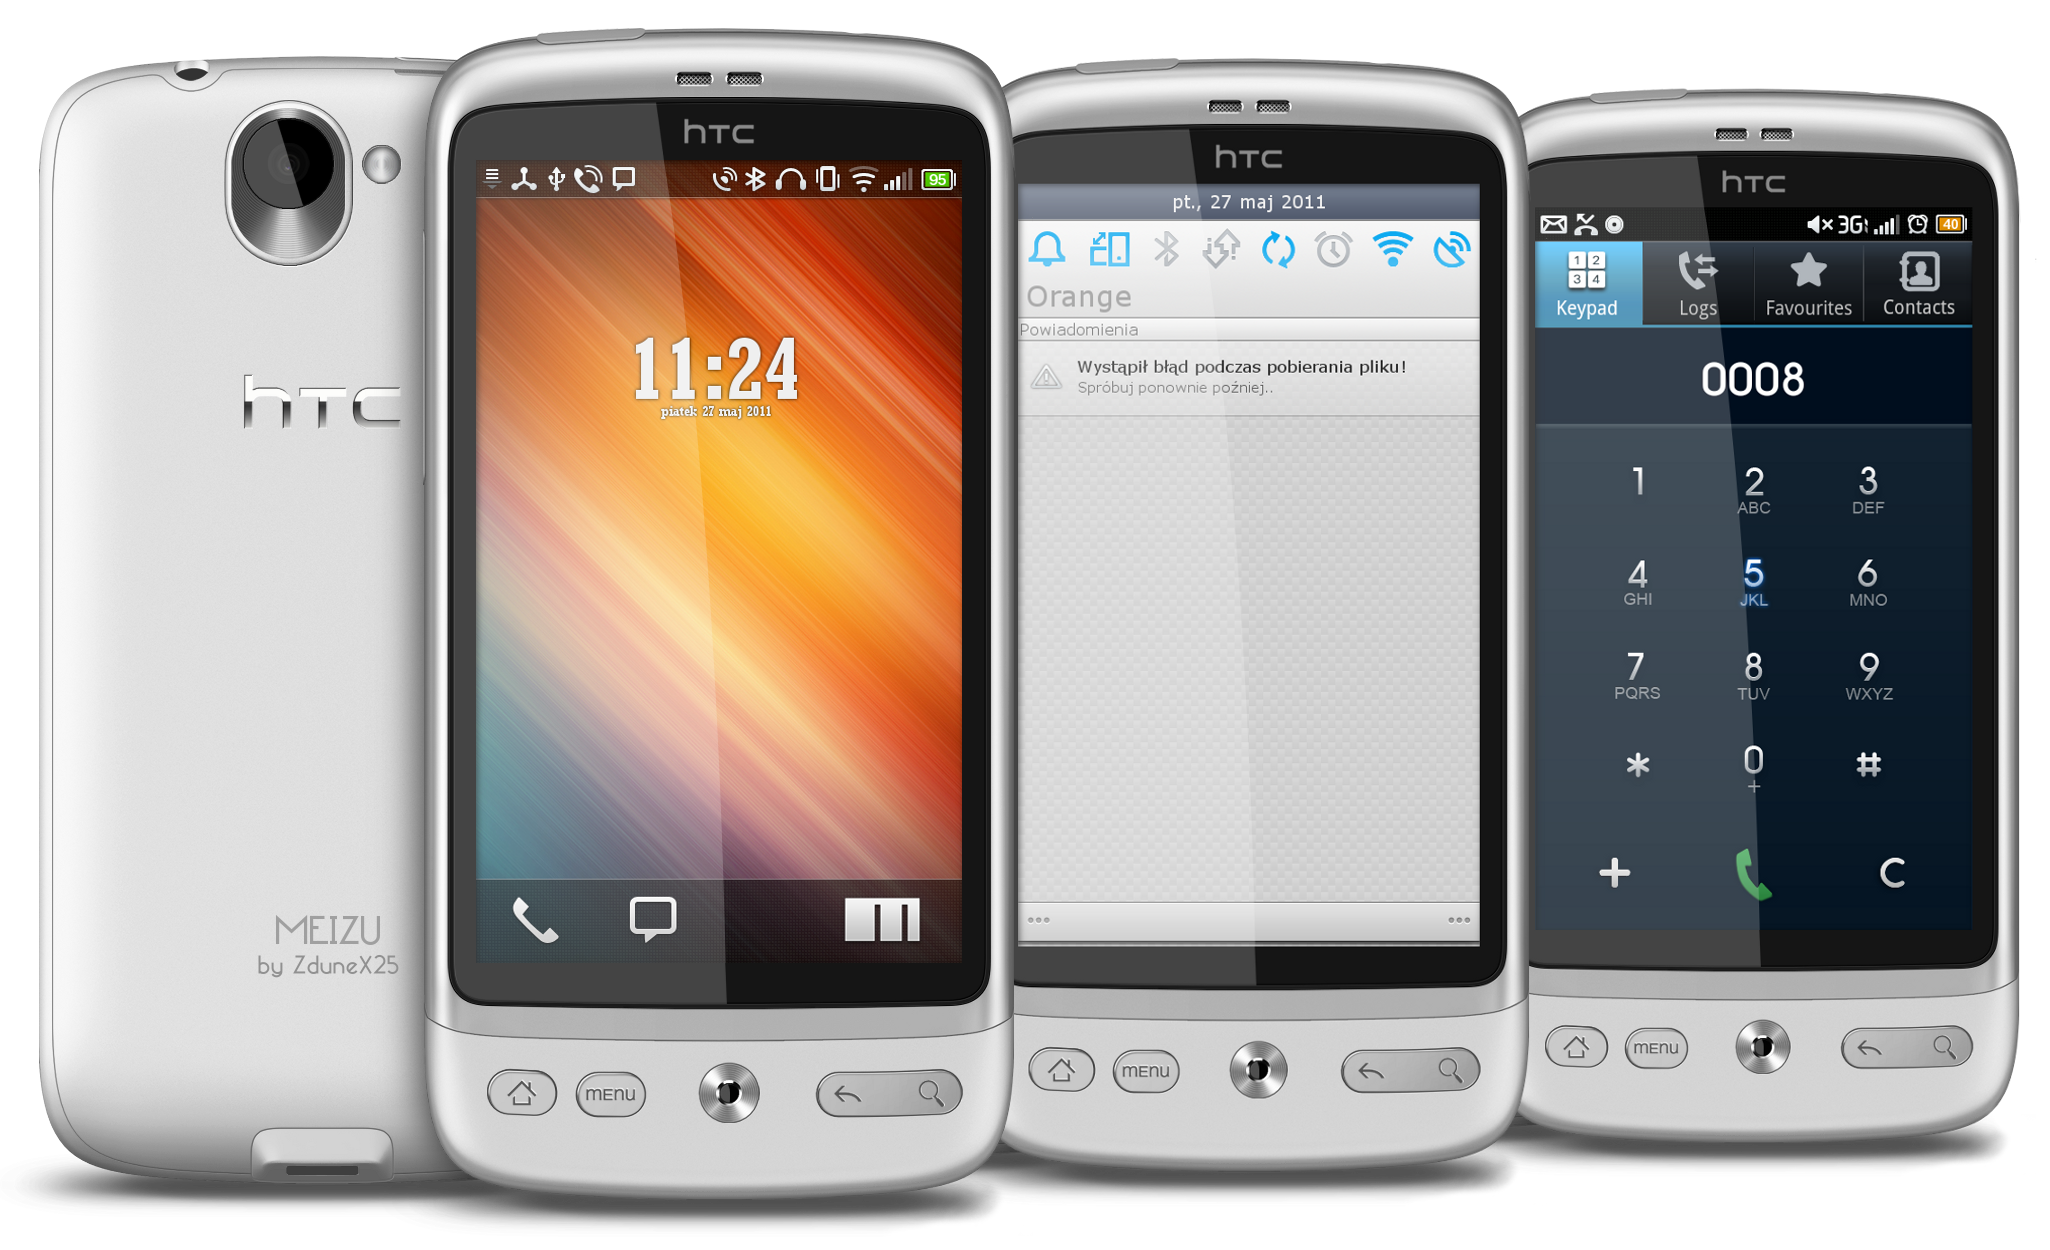 cm7 theme meizu v8 0 mdpi hdpi for cm7 07 android development and hacking. Black Bedroom Furniture Sets. Home Design Ideas